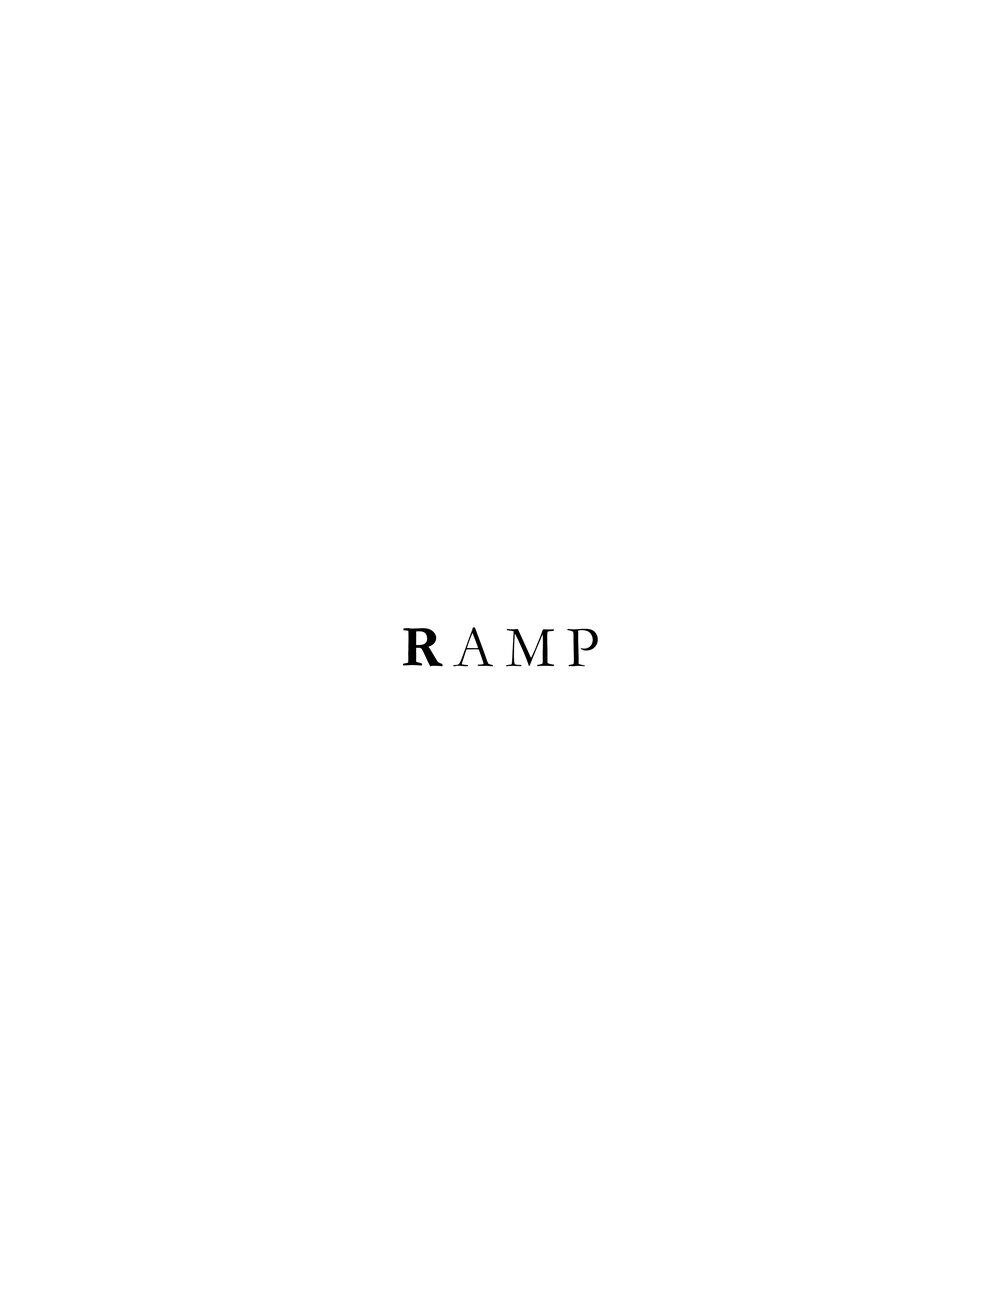 Ramp TEXT.jpg